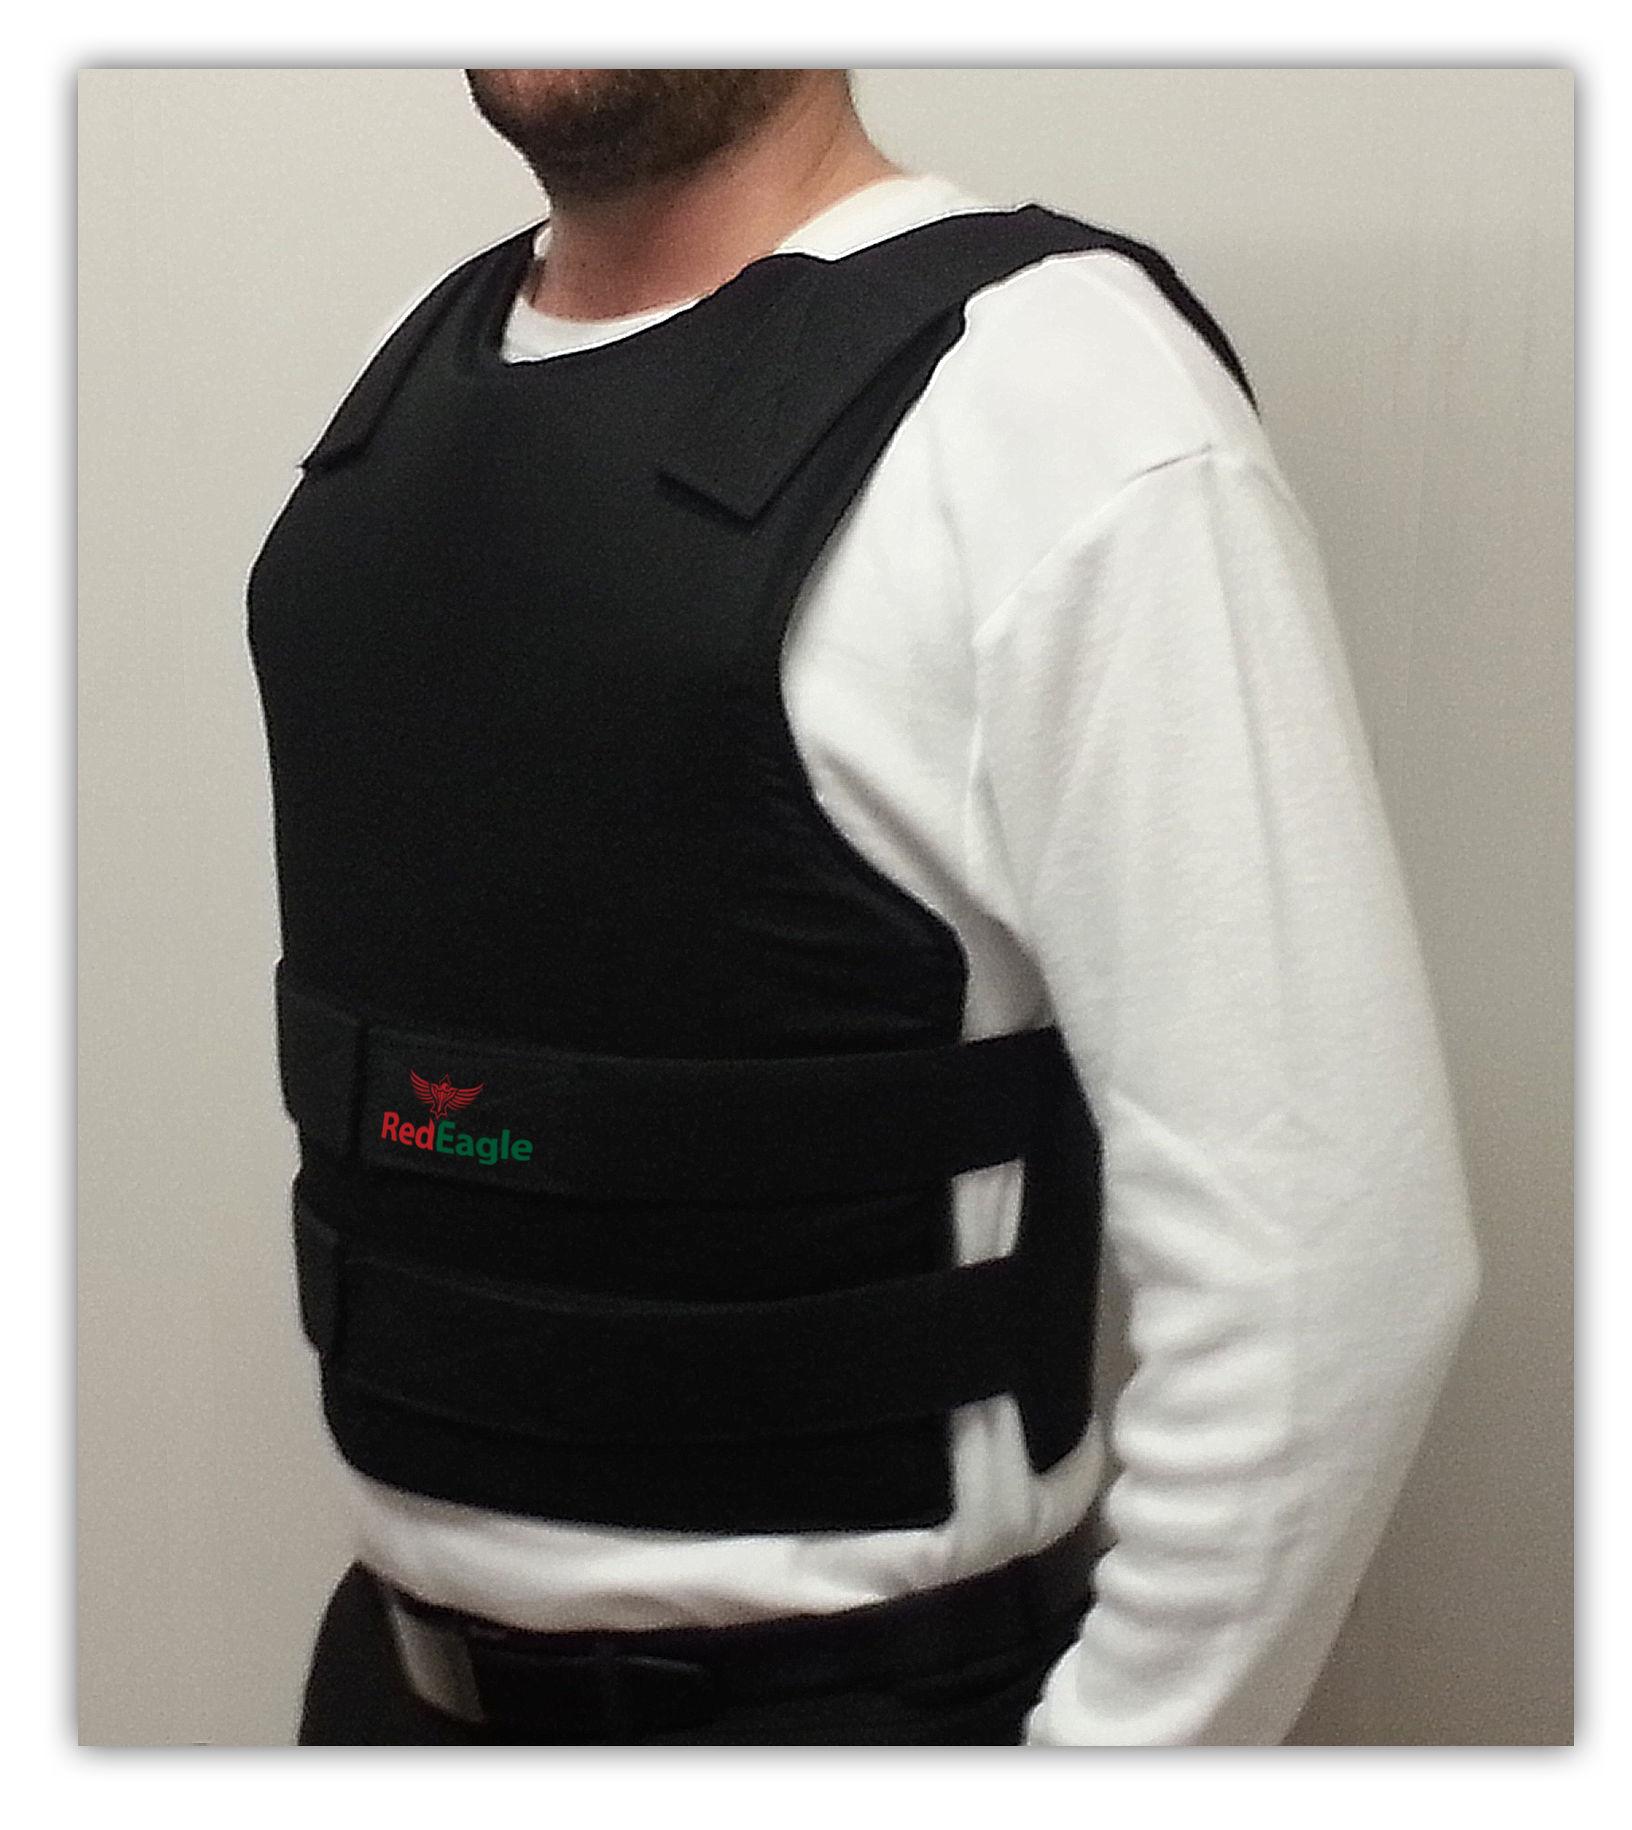 red eagle concealable bulletproof vest affordable pricing